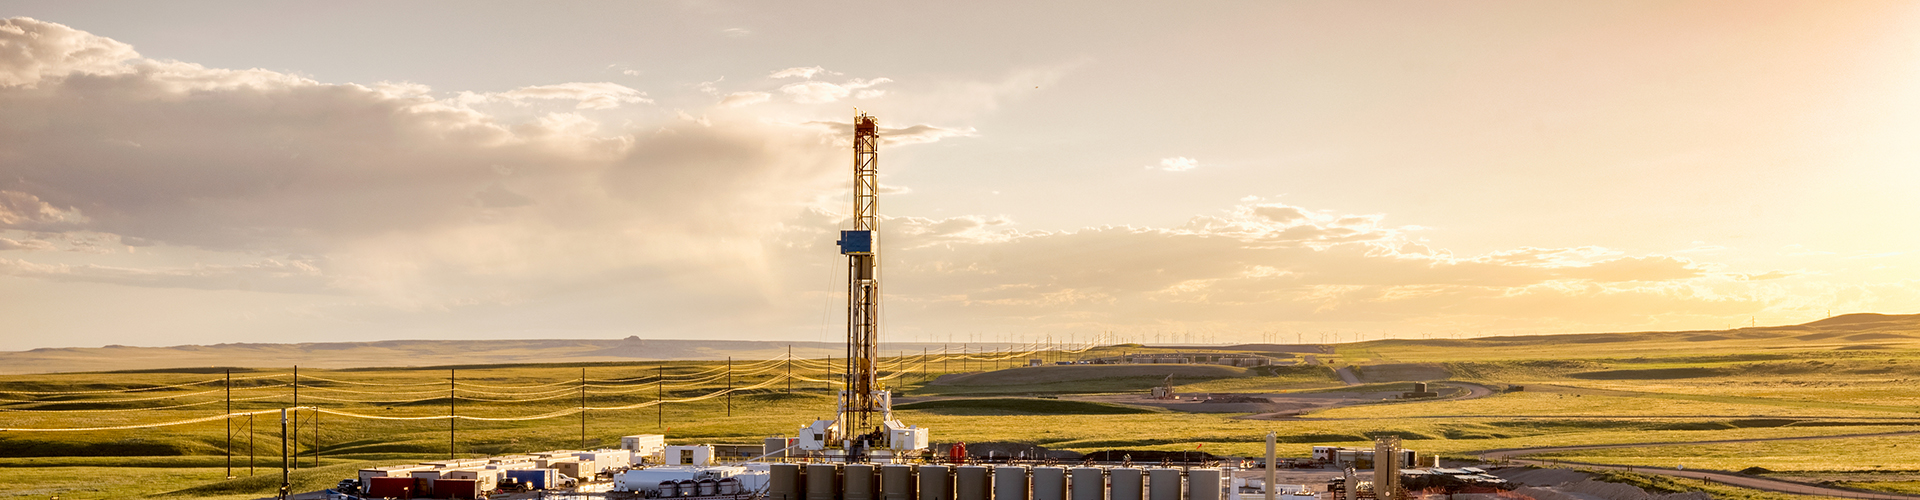 fracking what is fracking